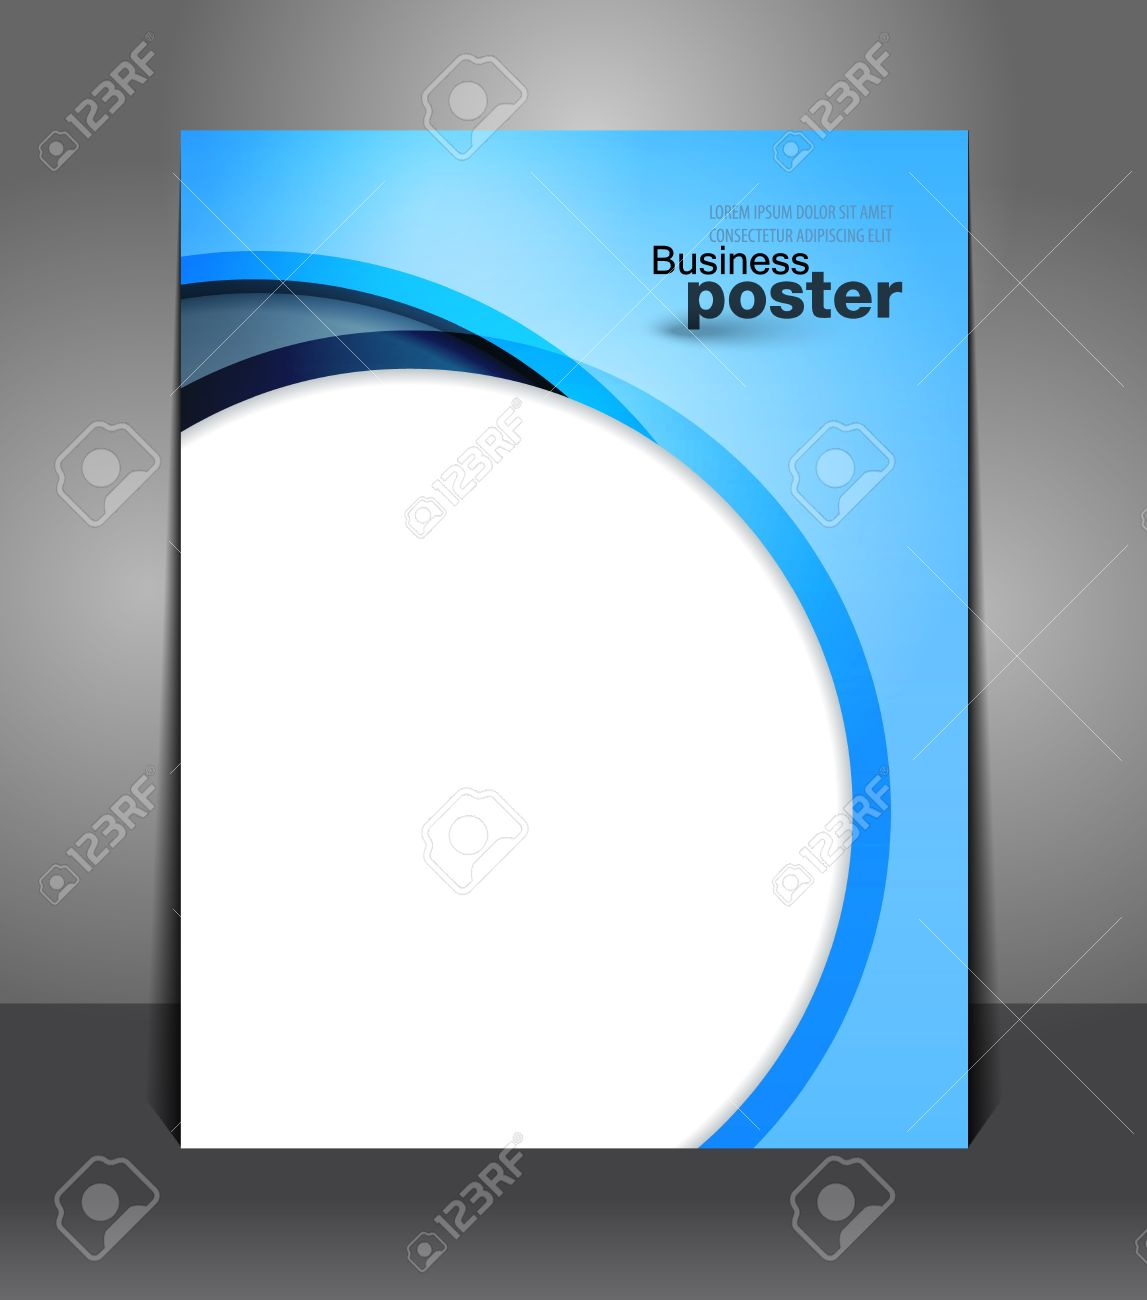 Poster design business -  Business Poster Flyer Design Content Background Design Layout Download